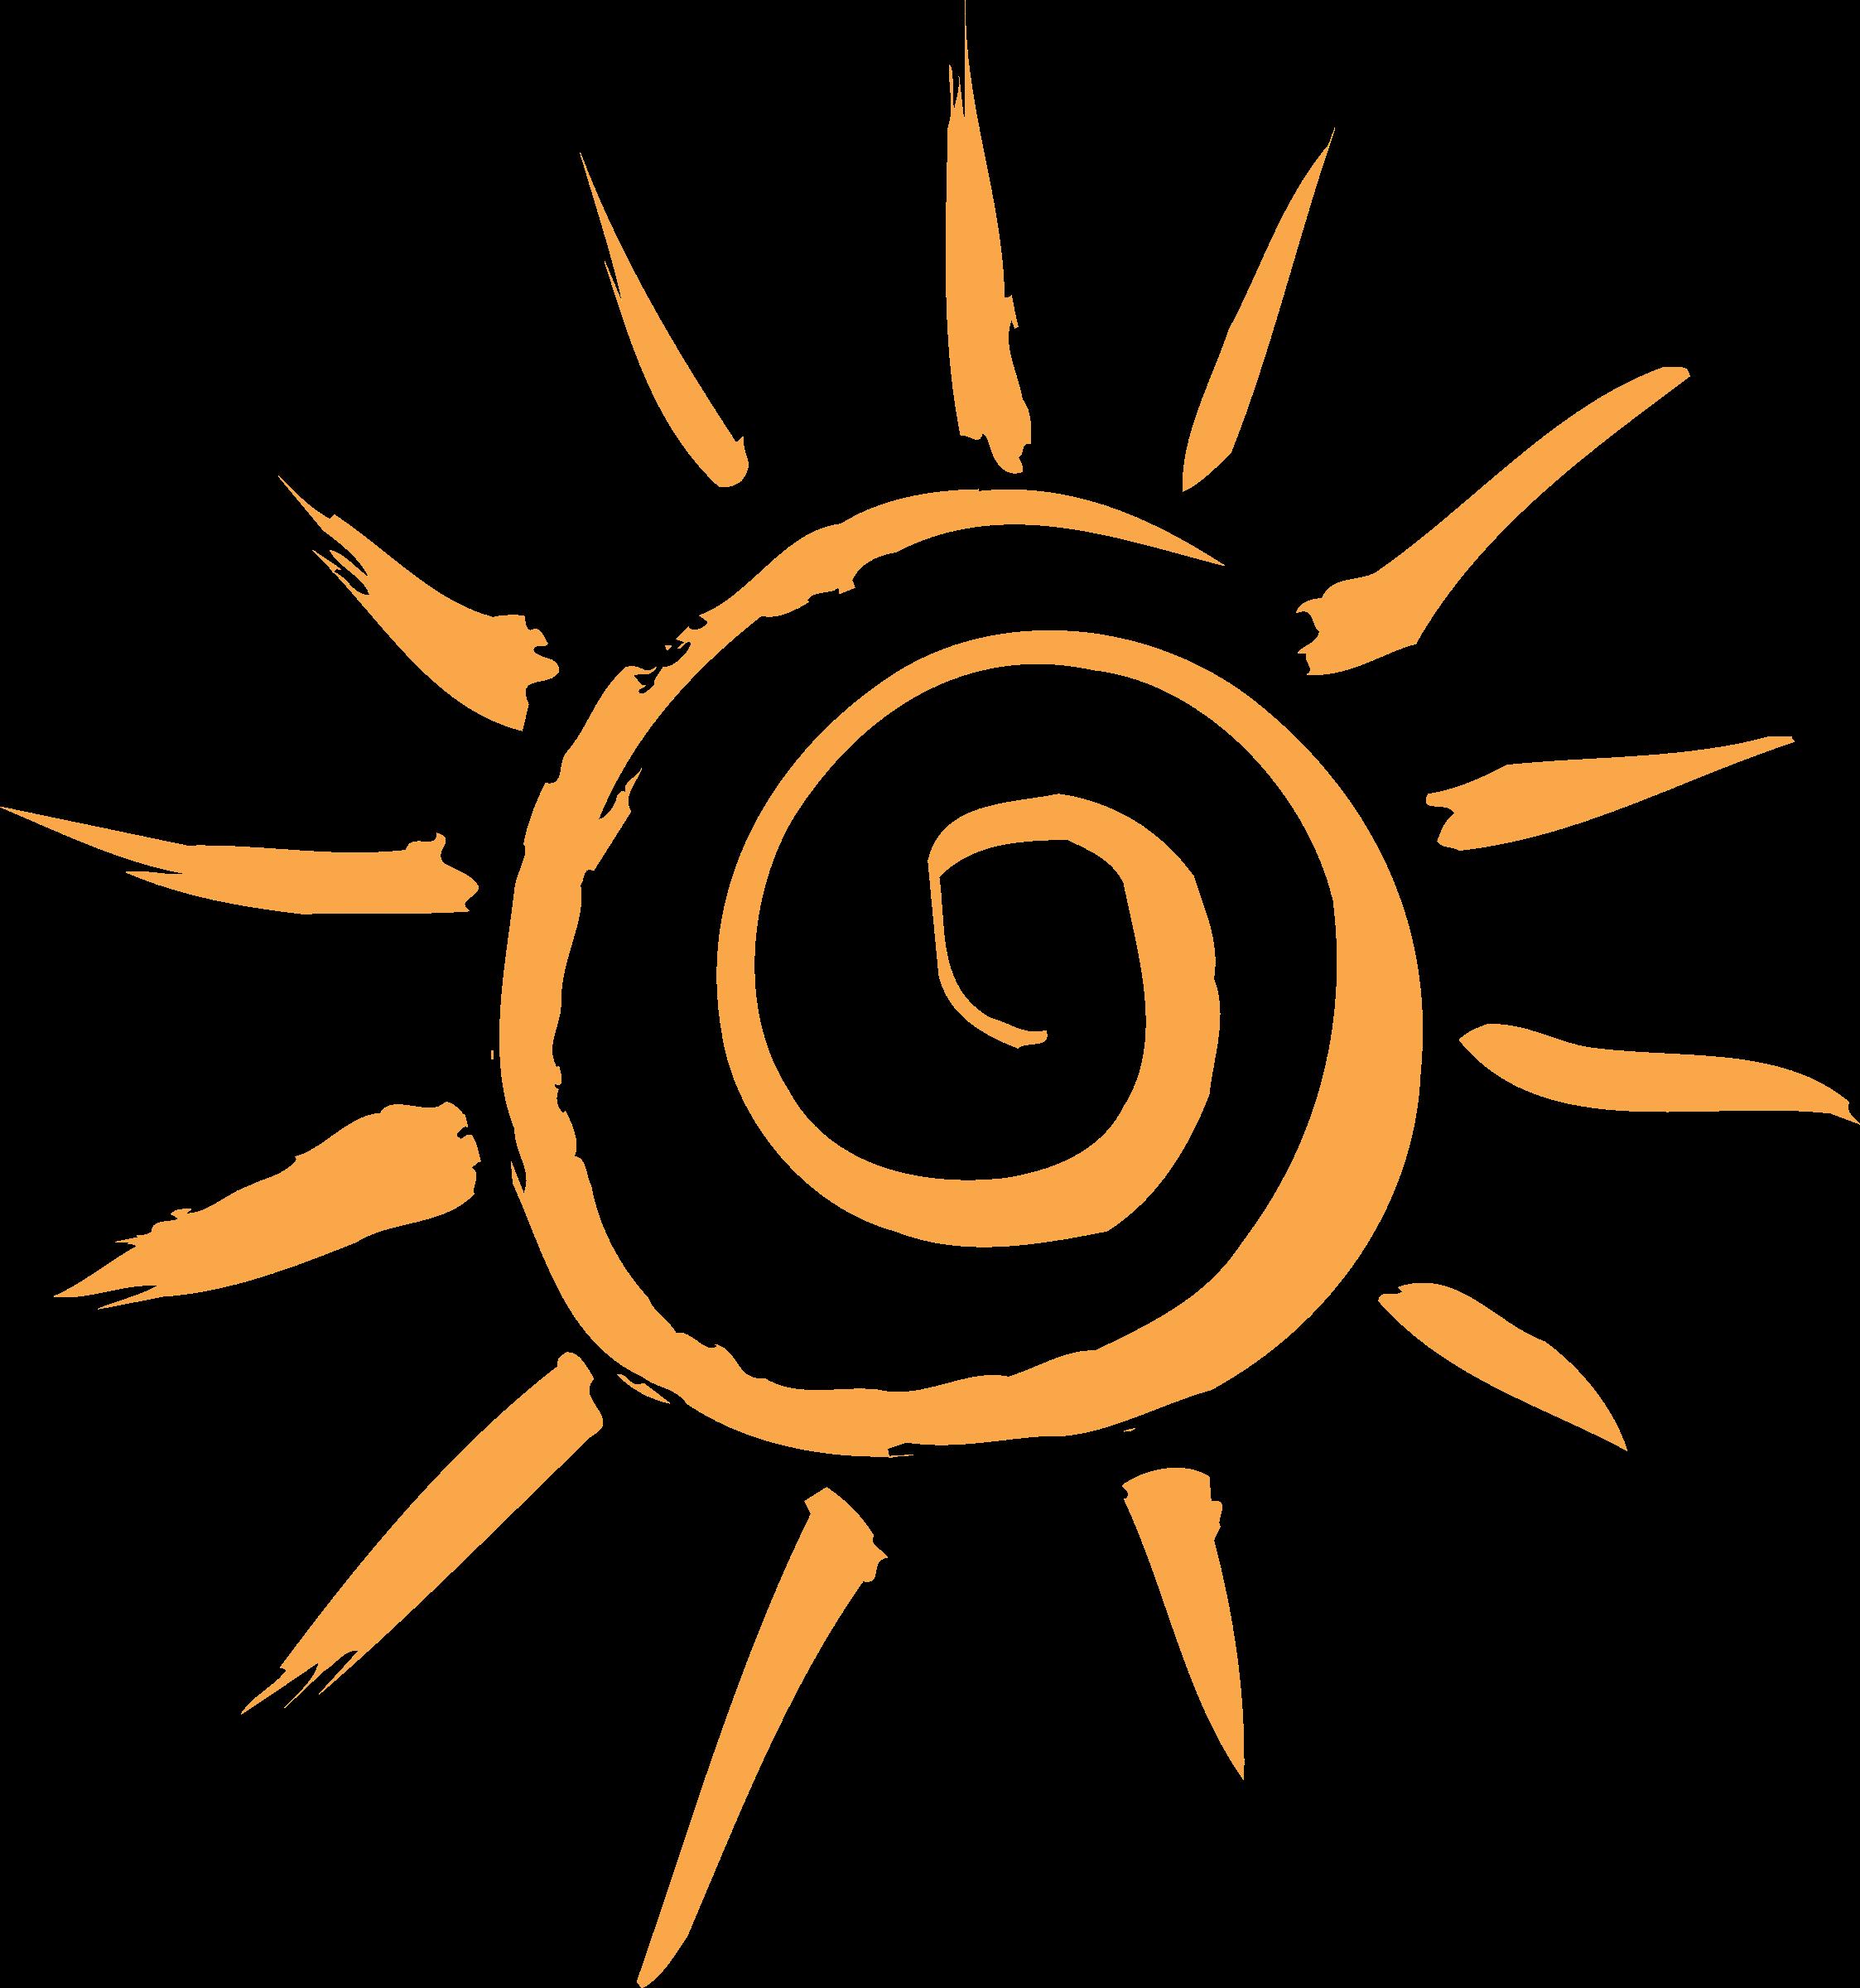 jpg free simple sun motif Icons PNG